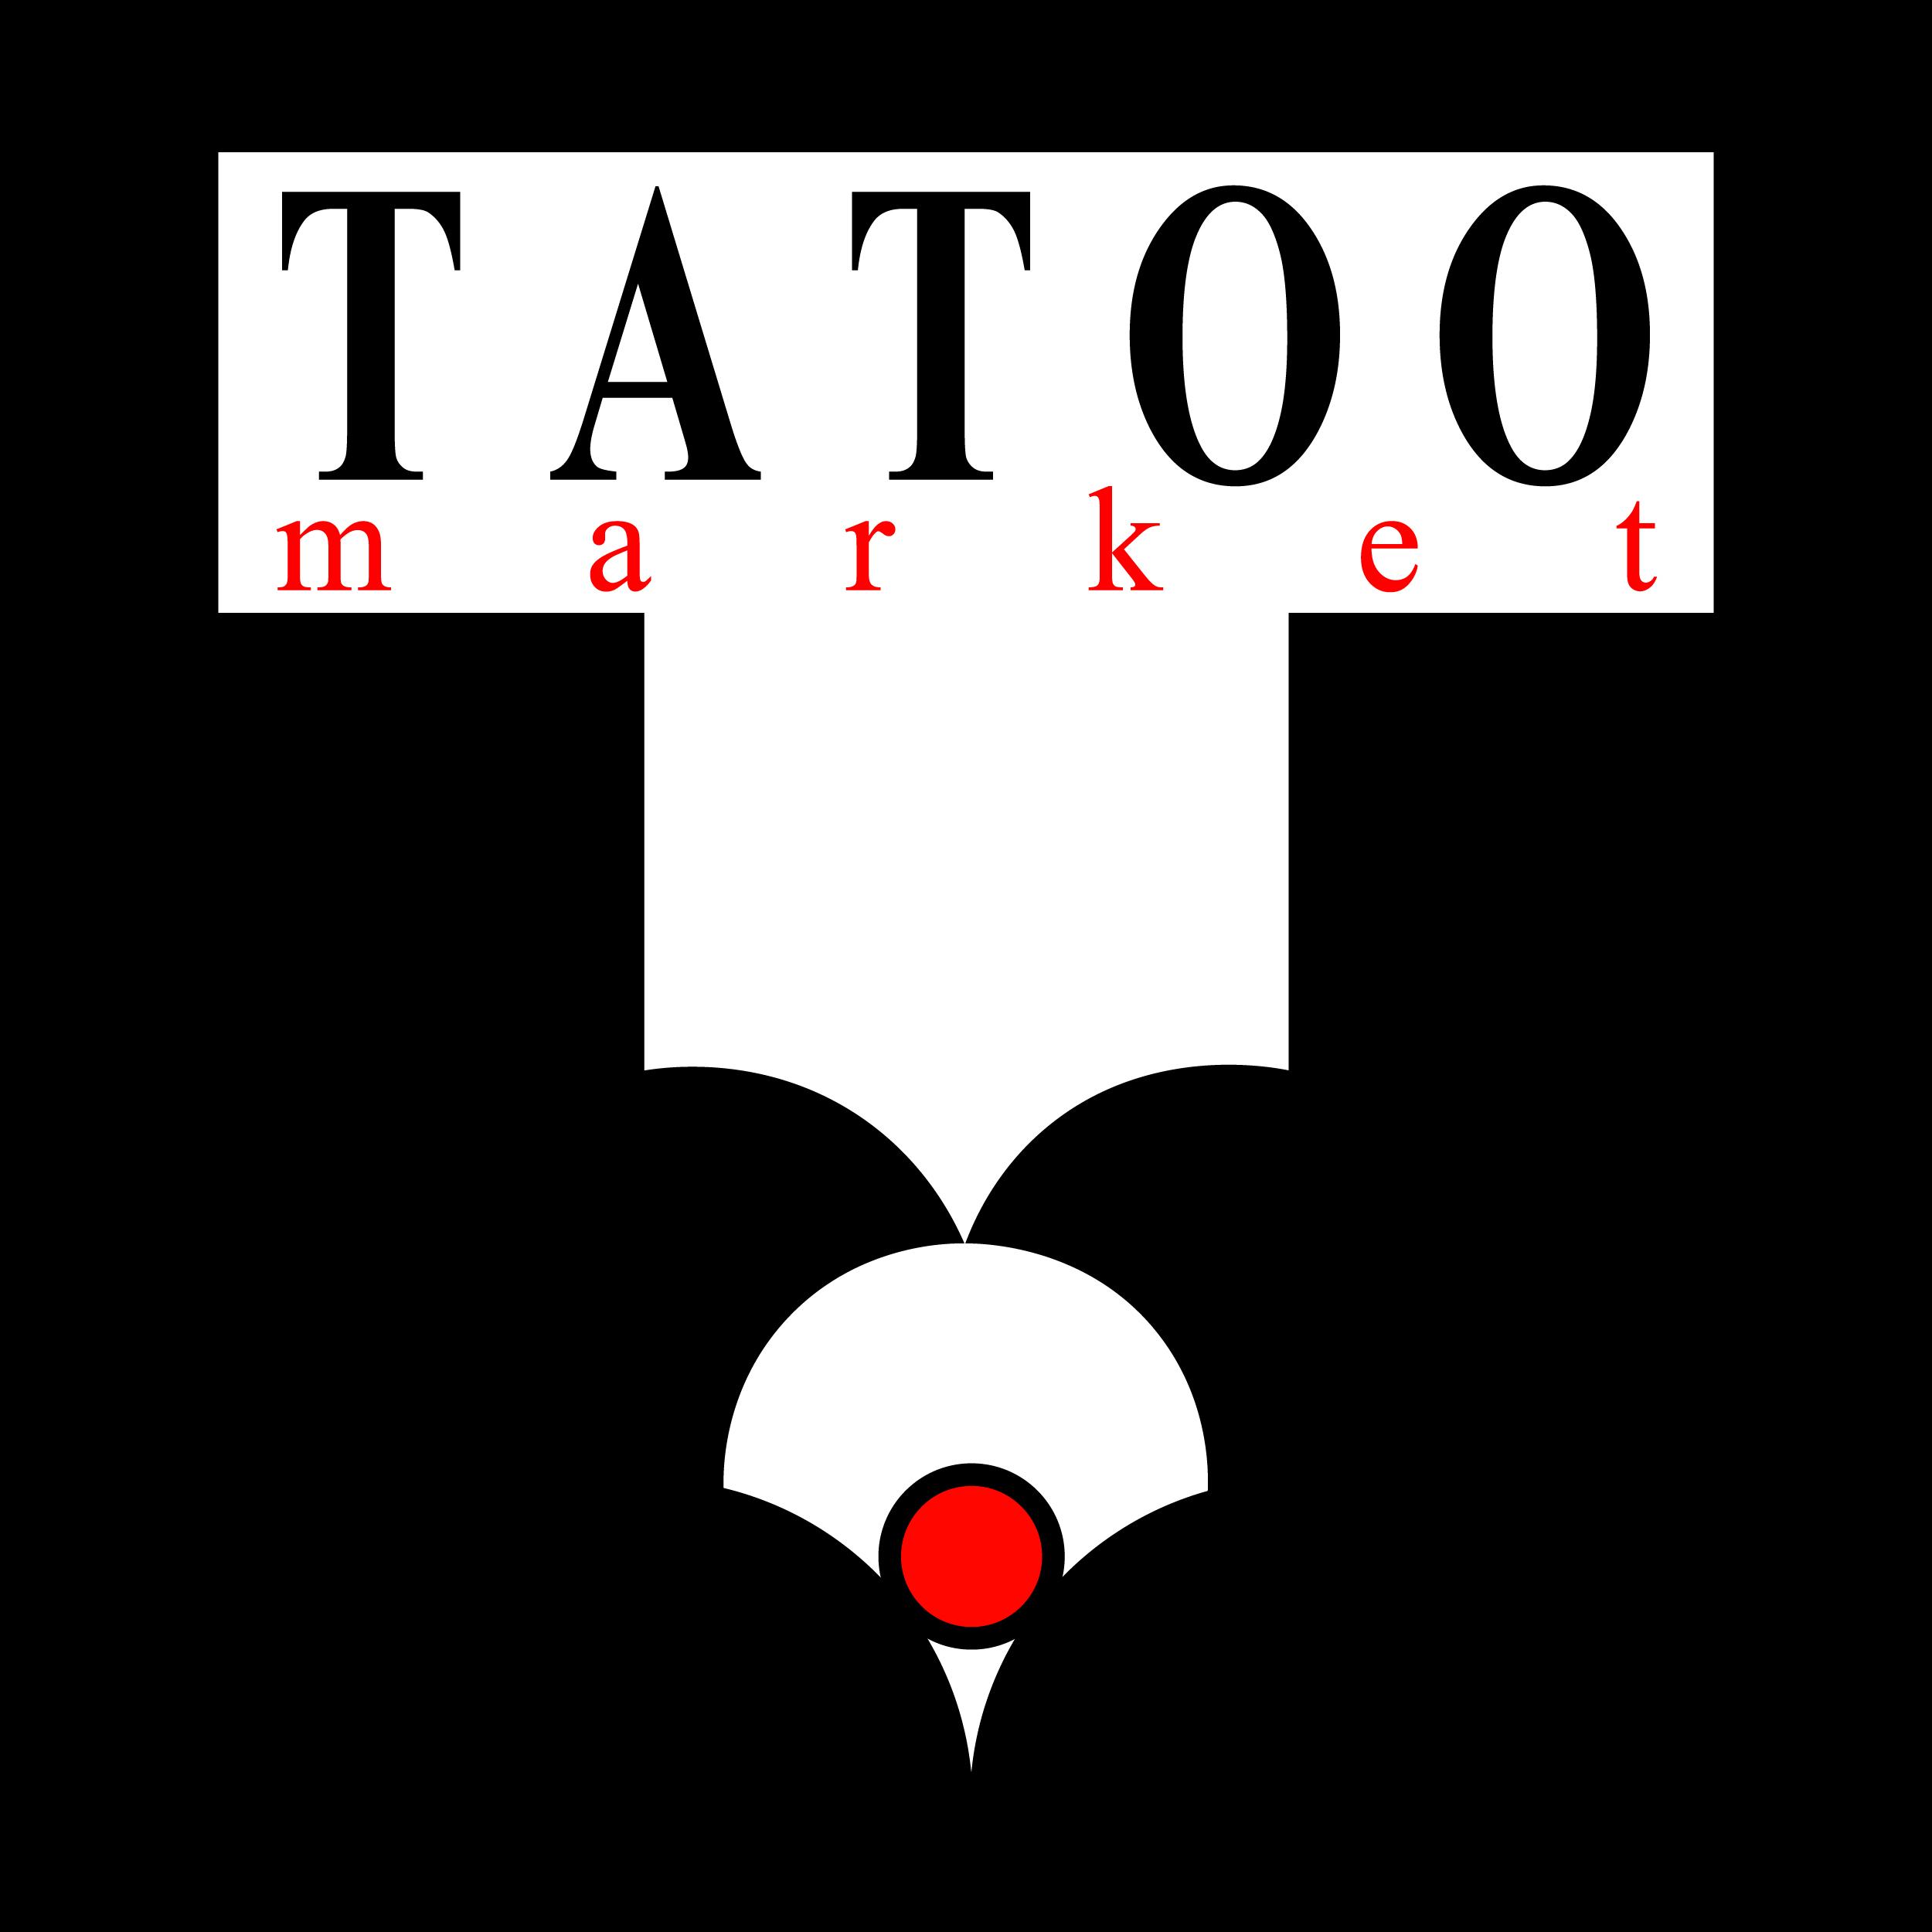 Редизайн логотипа магазина тату оборудования TattooMarket.ru фото f_4625c3a32b56f5b9.jpg